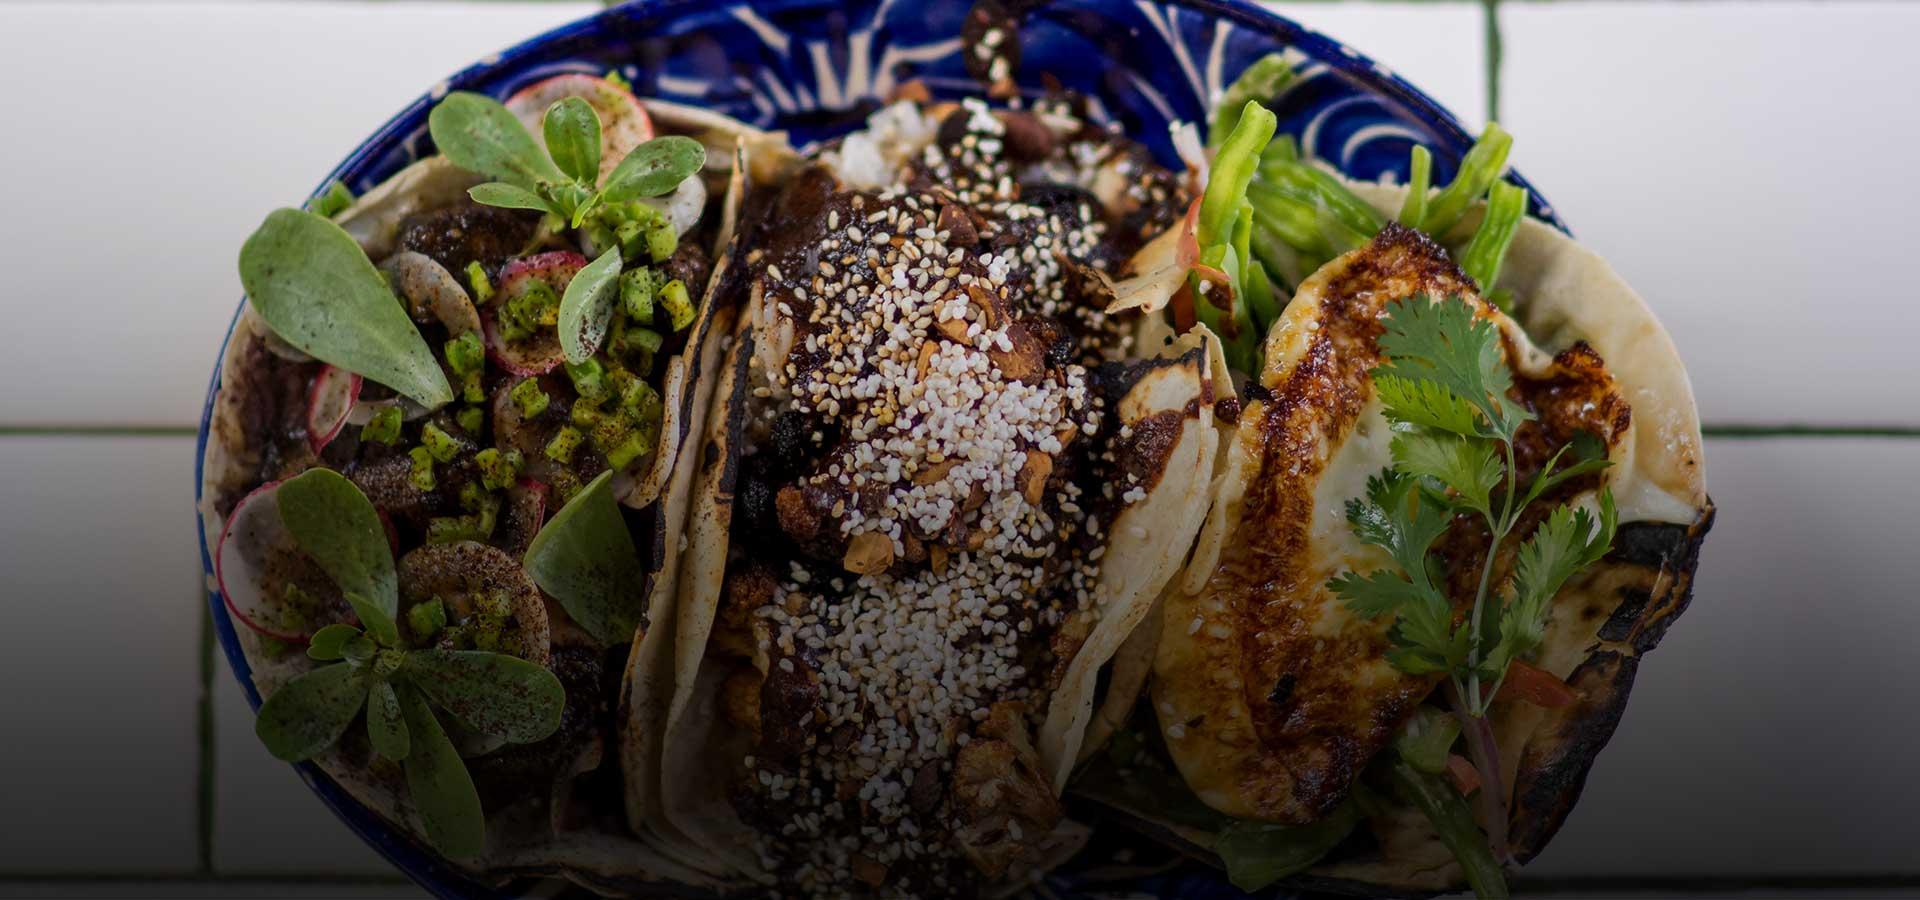 tijuana gastronomia tijuana baja california